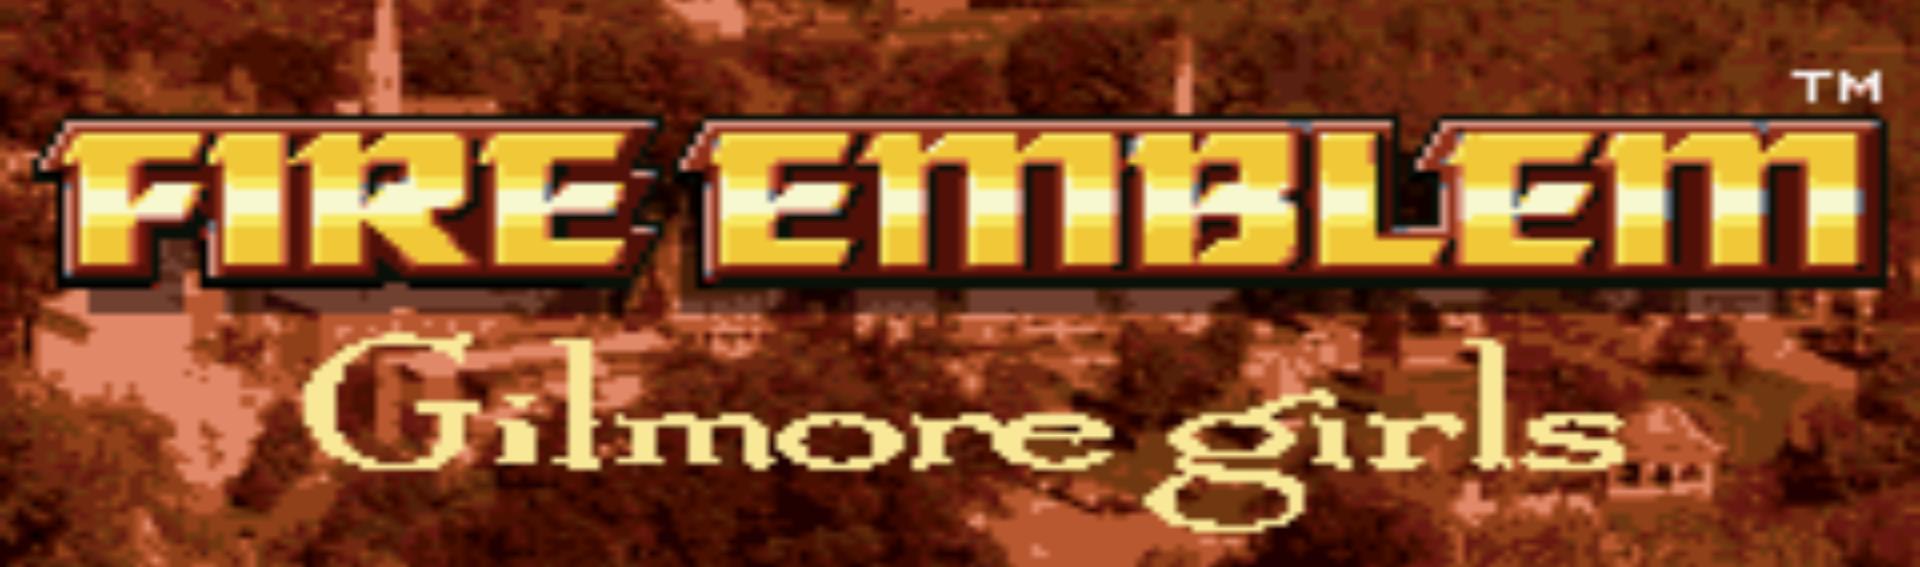 Fire Emblem Gilmore Girls Edition